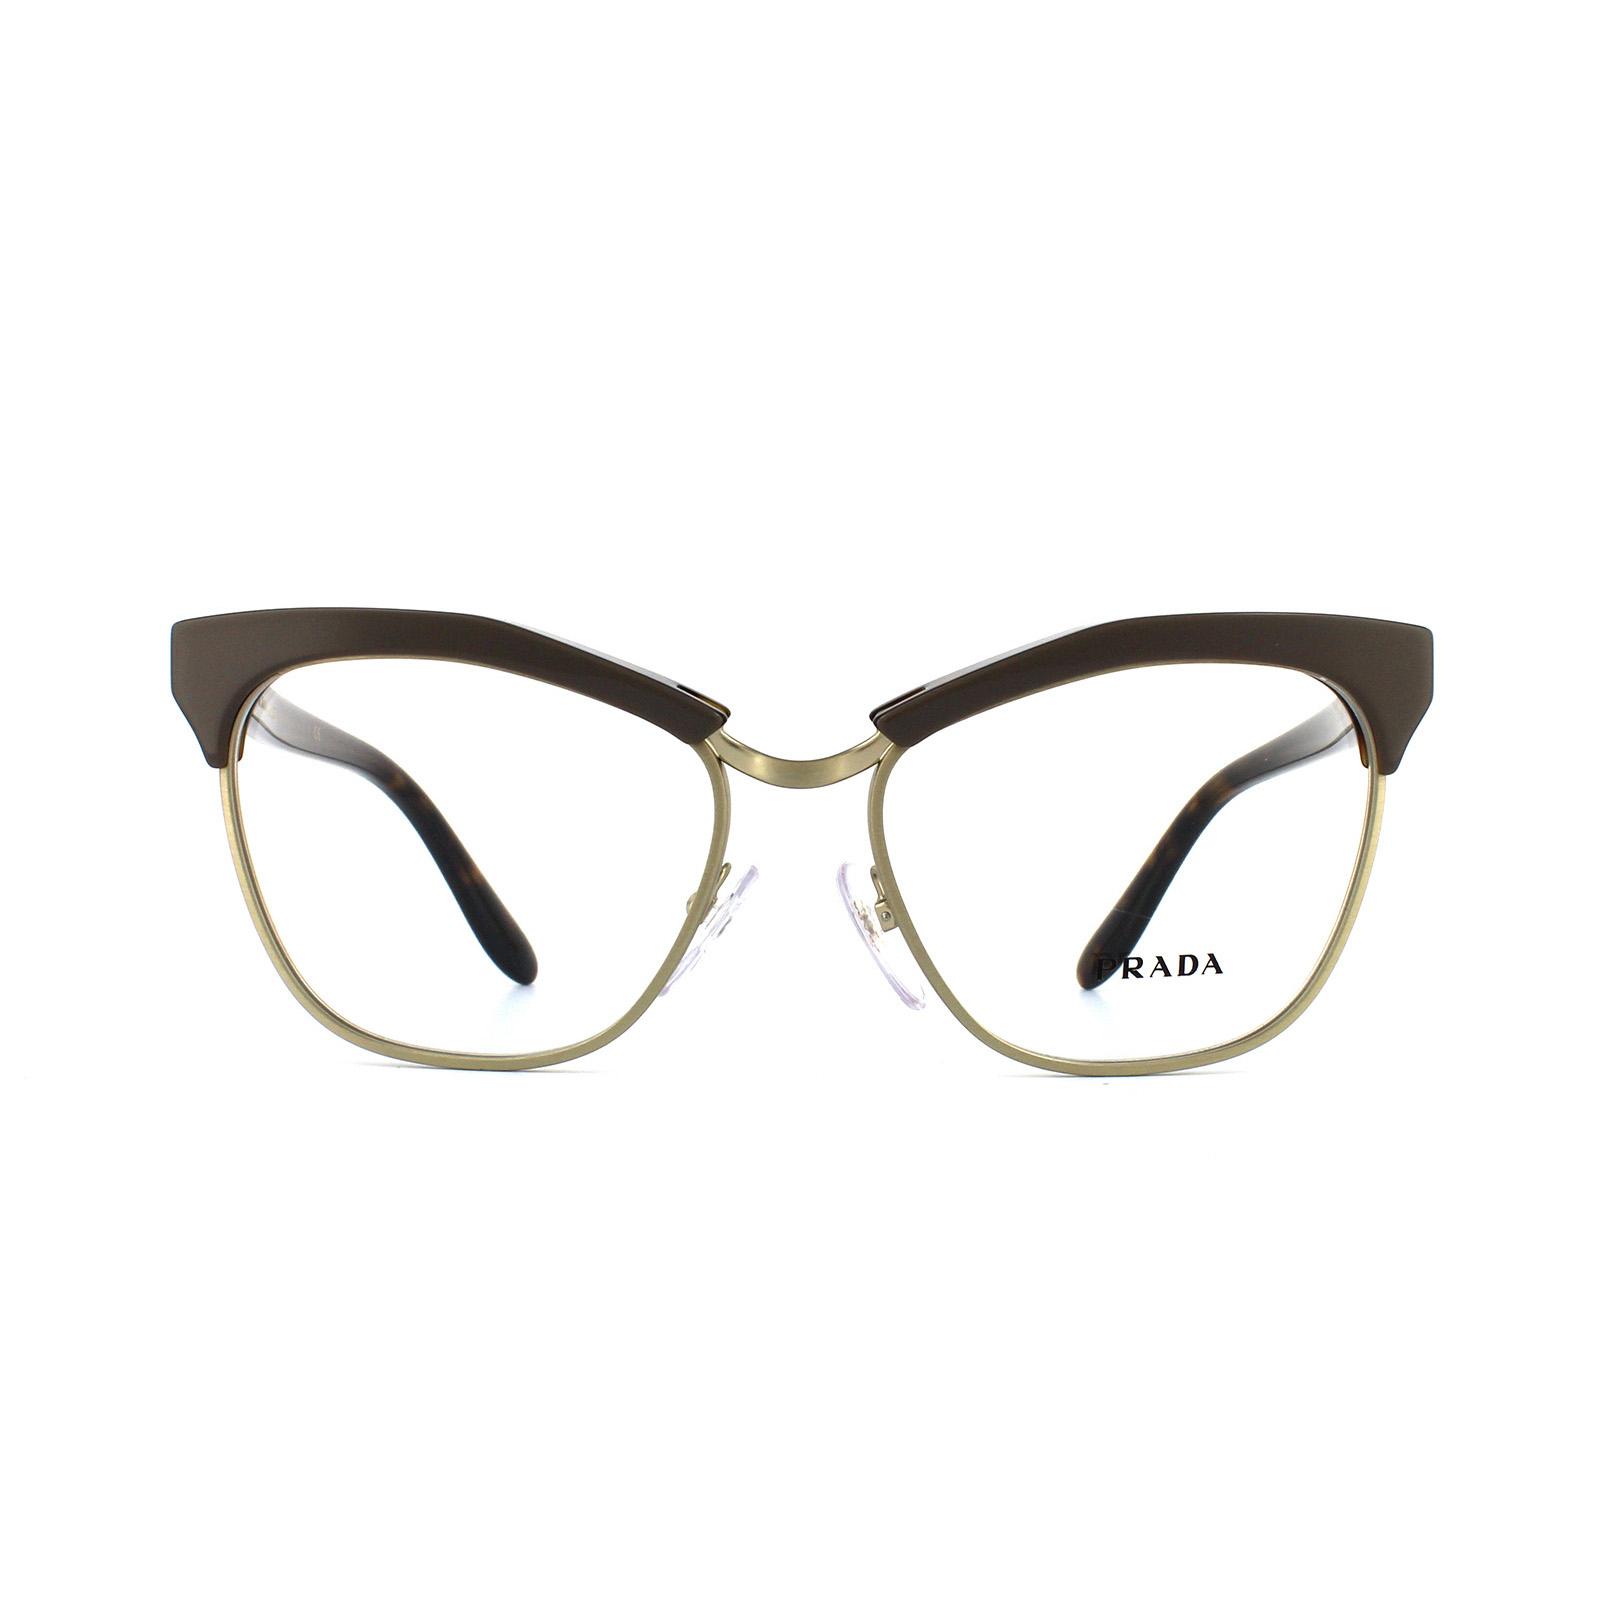 410bfe7a5bd4e Sentinel Prada Glasses Frames 14SV TFL1O1 Brown Havana Womens 55mm